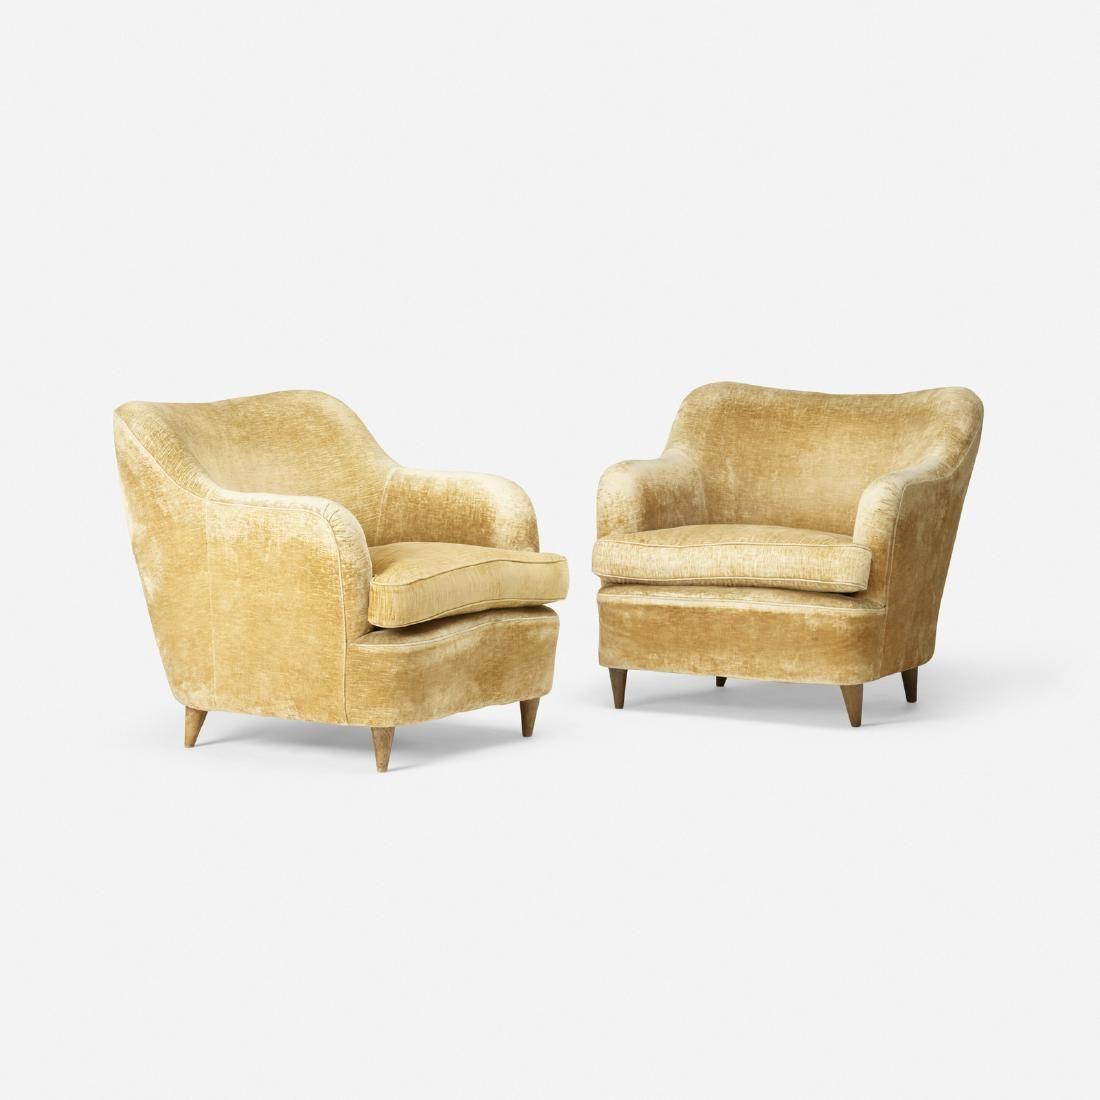 Gio Ponti, lounge chairs, the Hotel Bristol, Merano